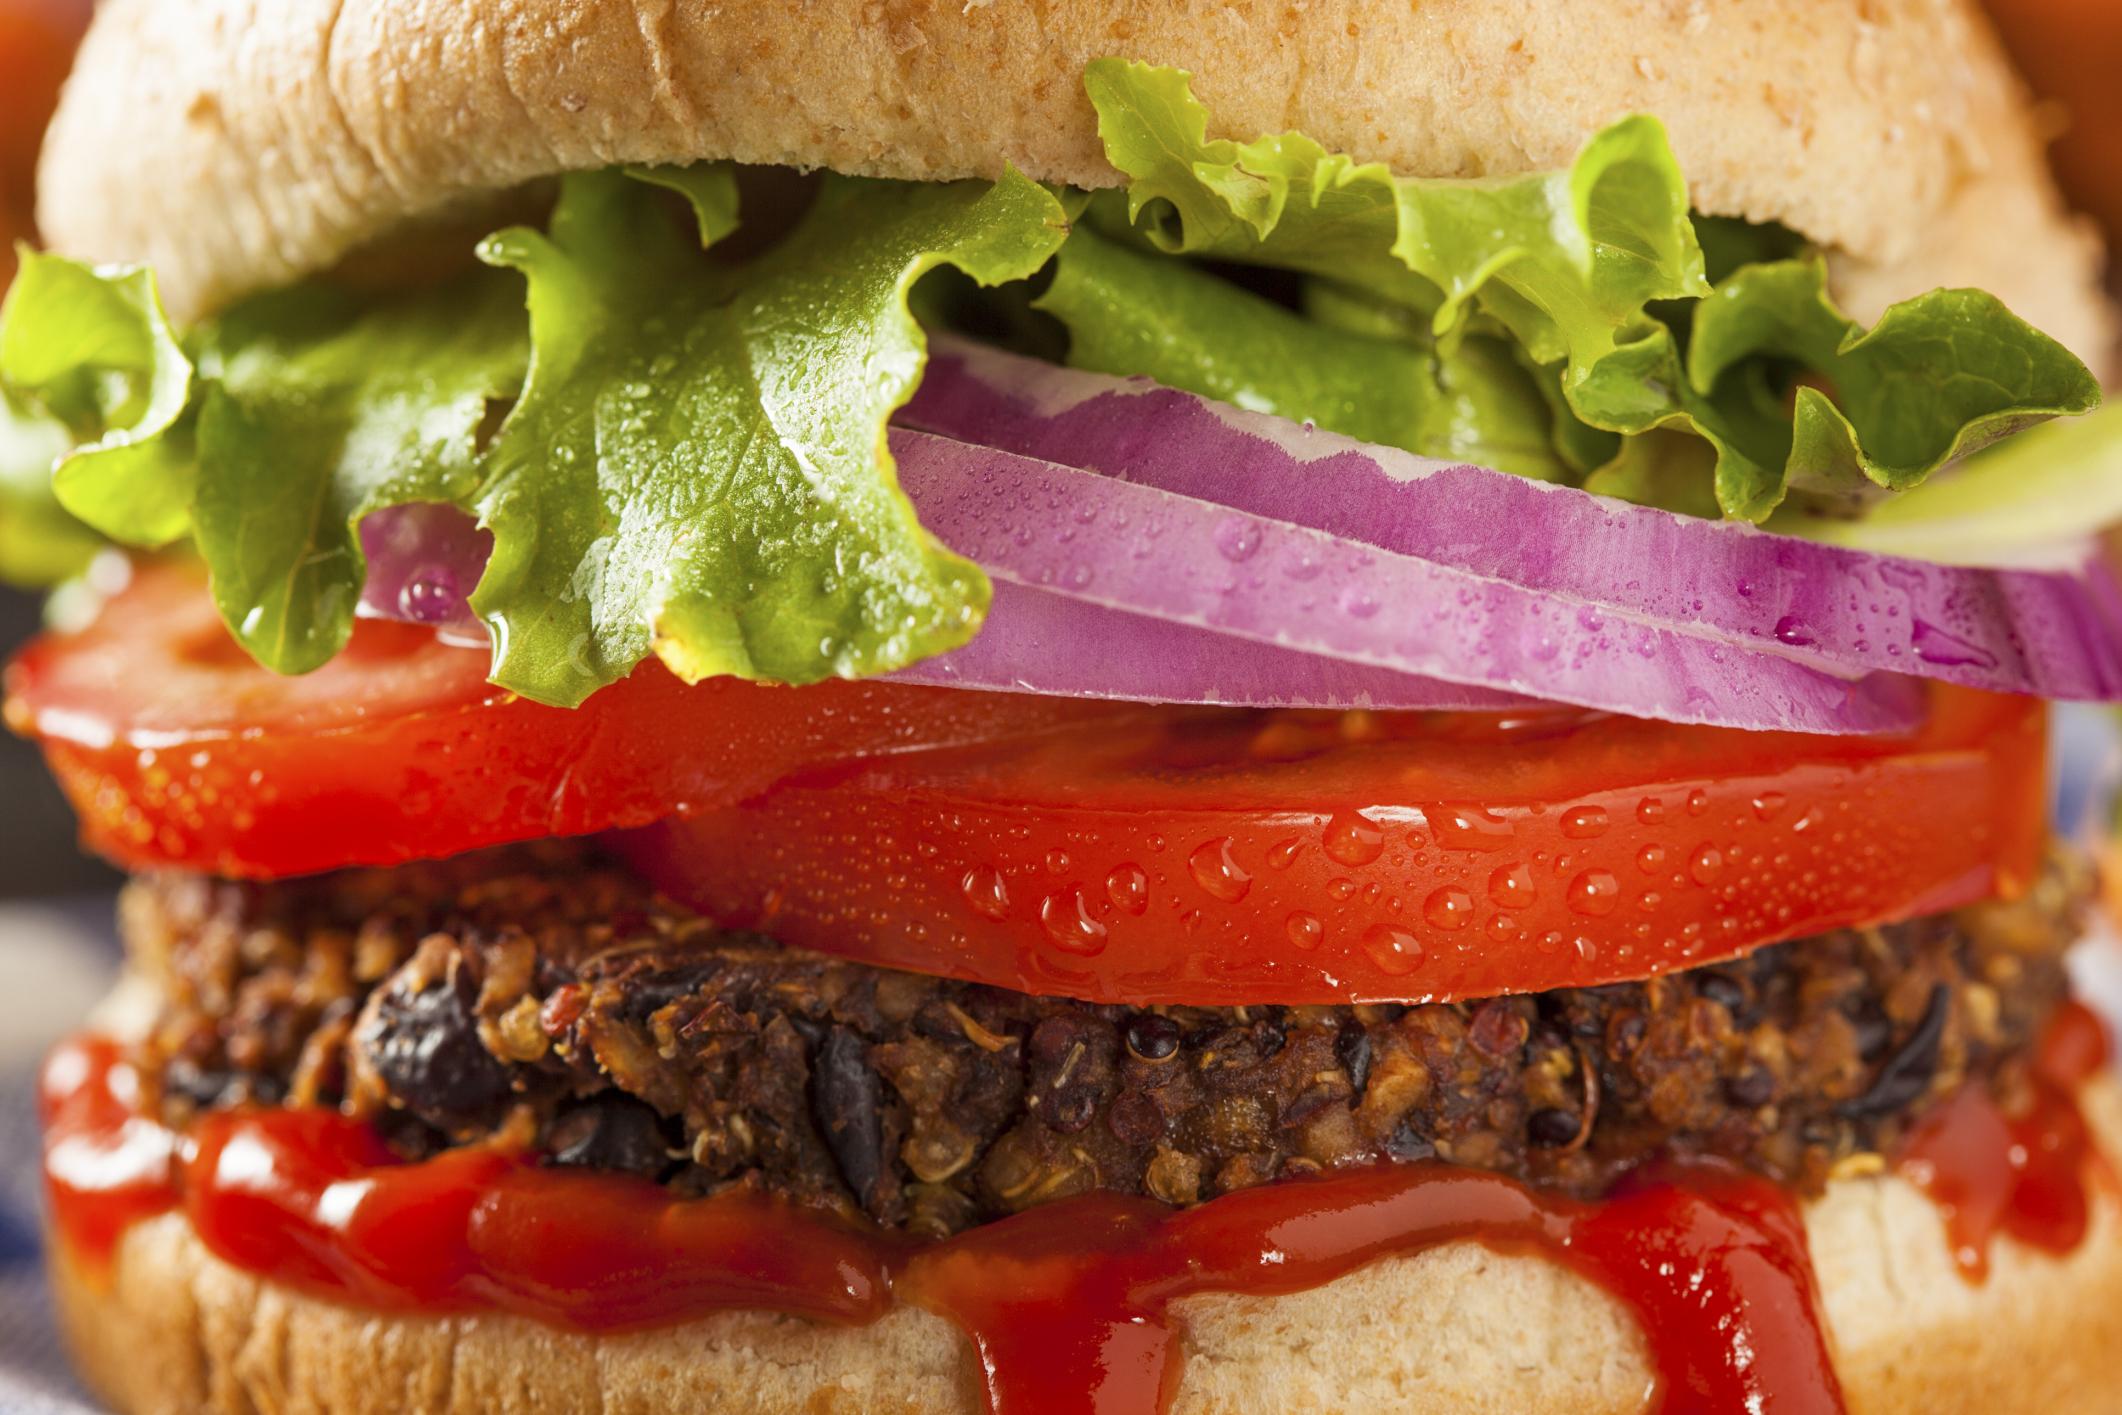 burger calories calculator best burger 2017